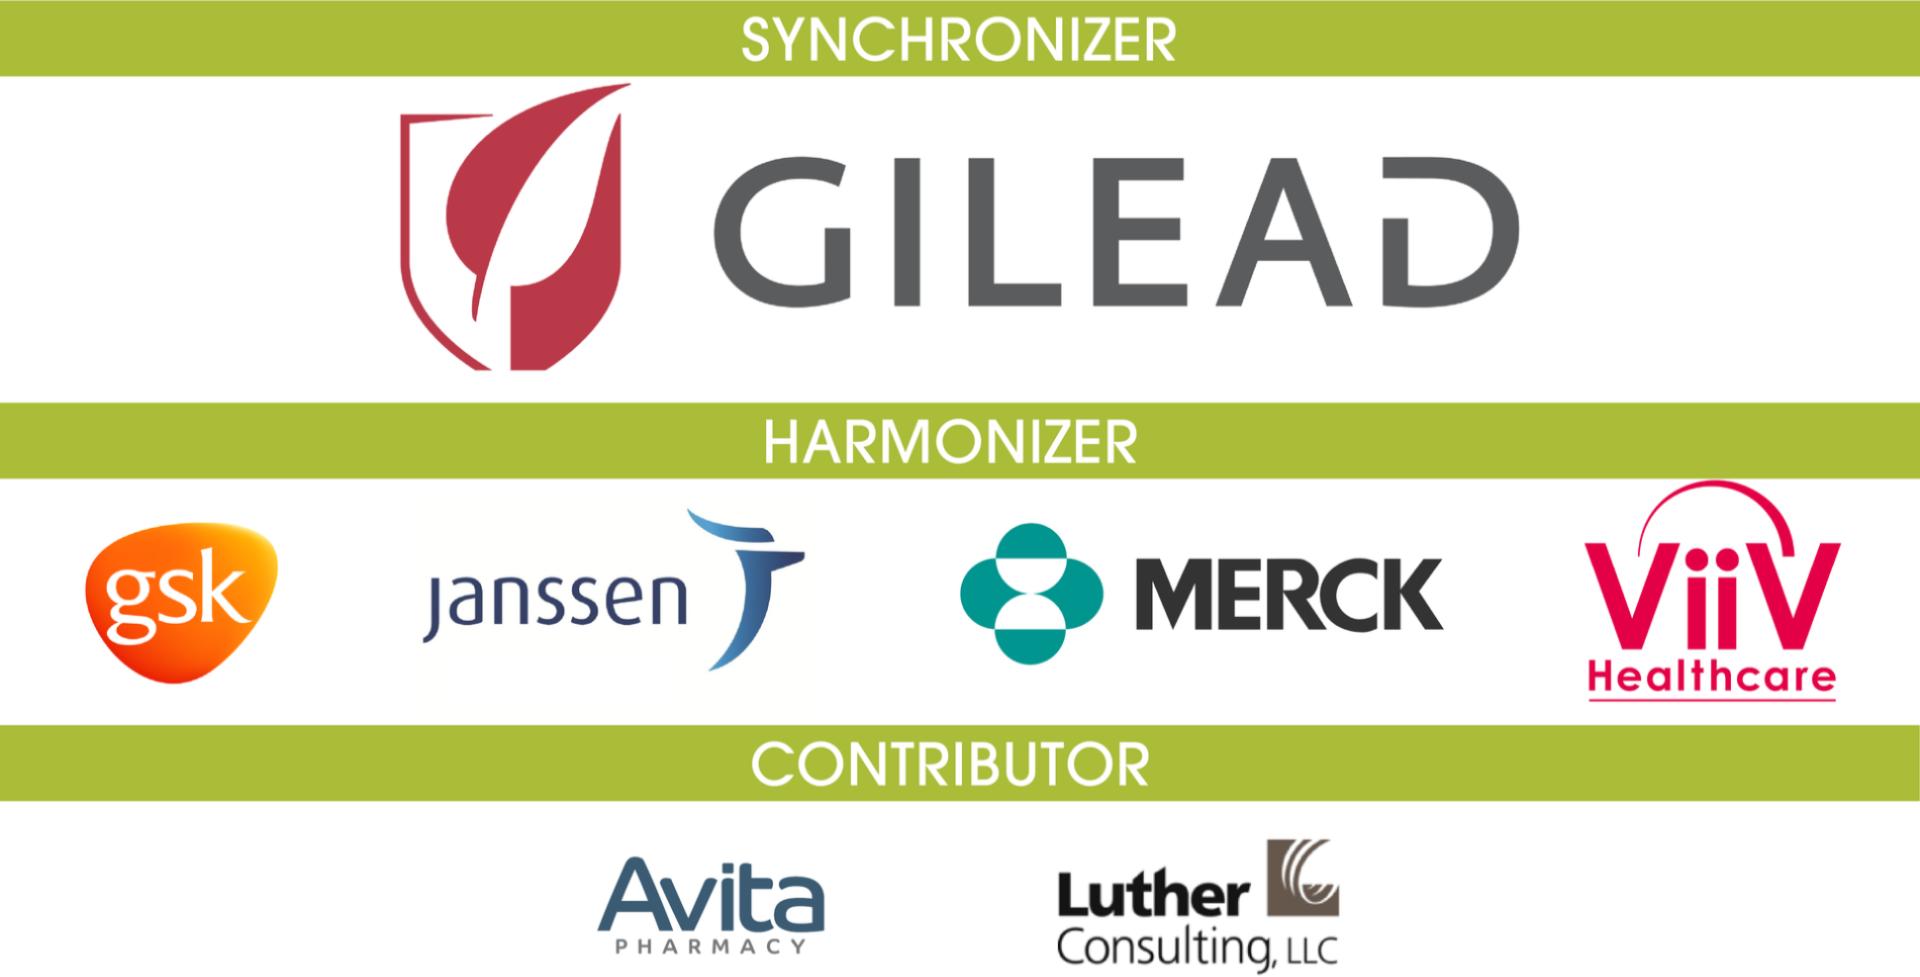 SYNC 2020 Sponsors